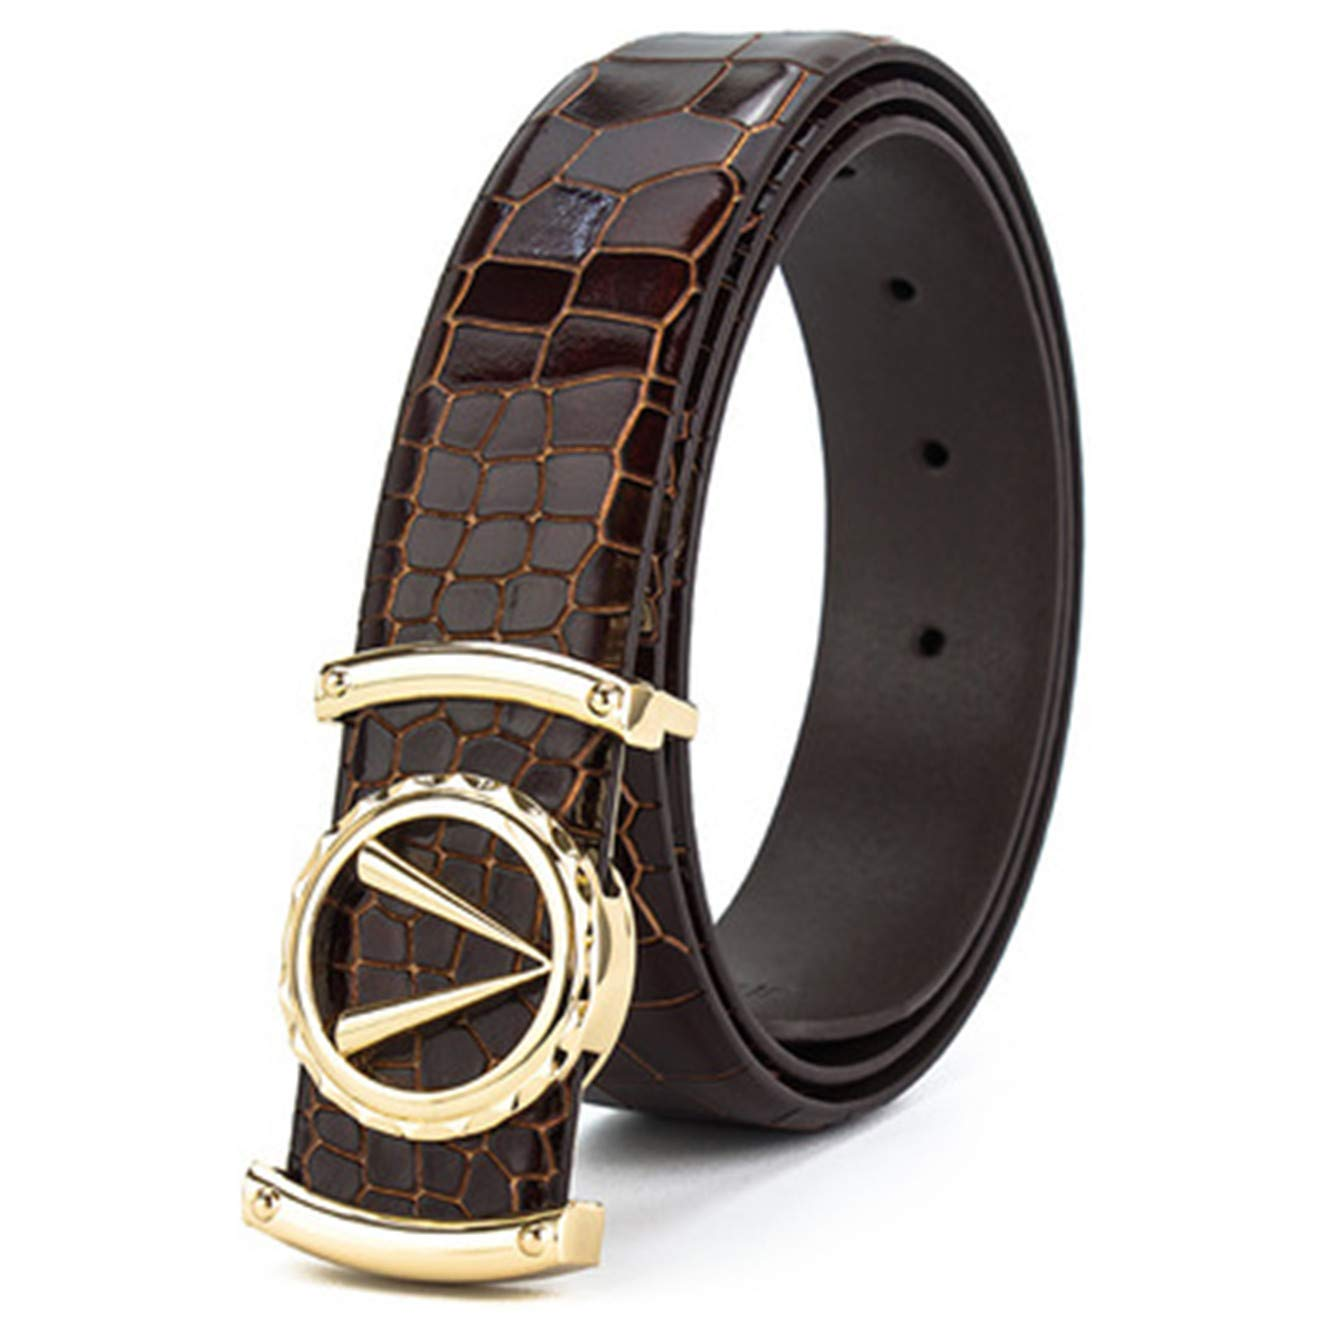 Mens crocodile pattern V-shaped leather business casual belt